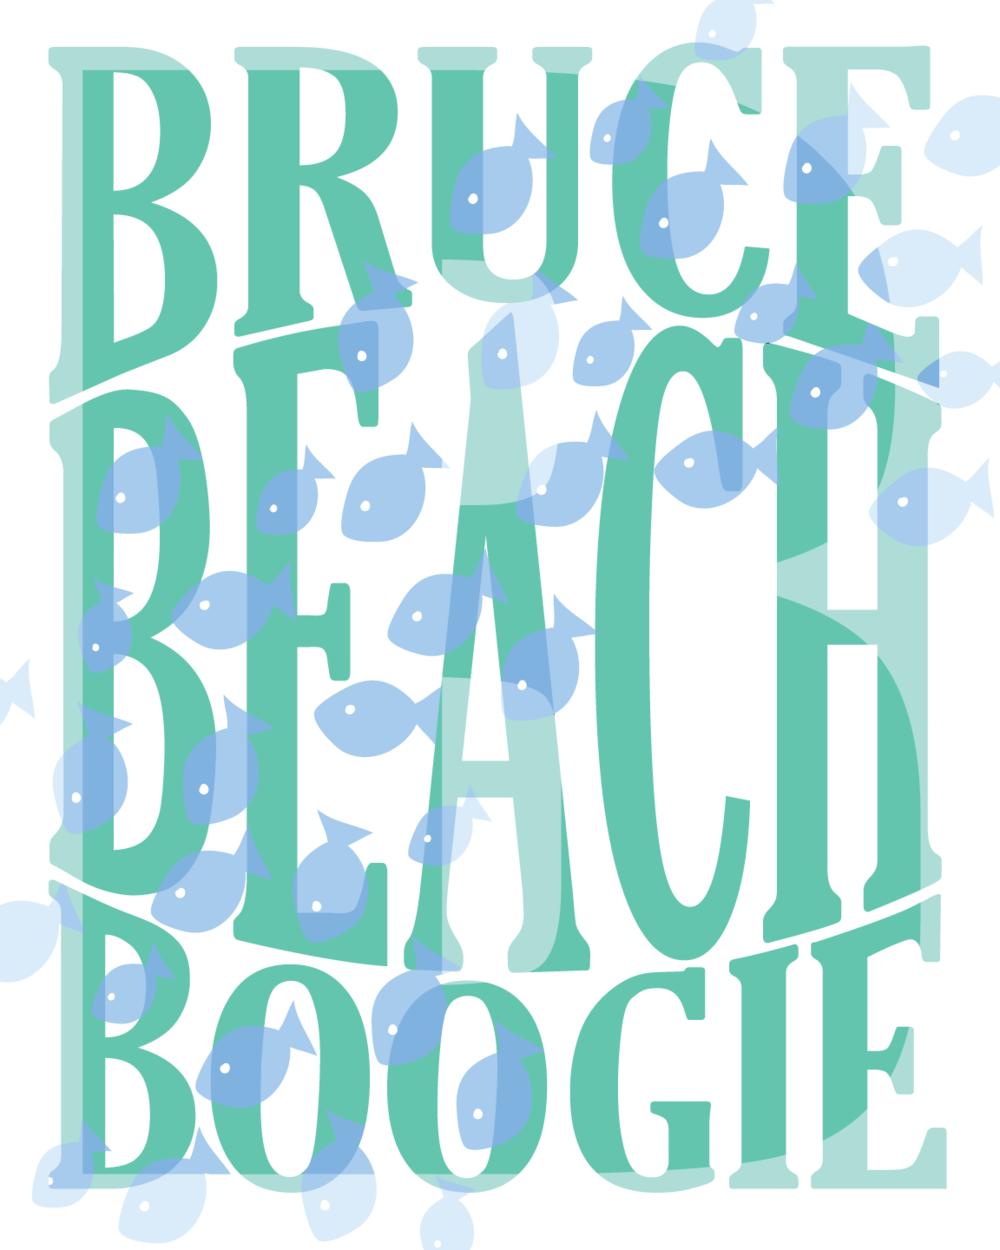 Bruce-Beach-Boogie.png